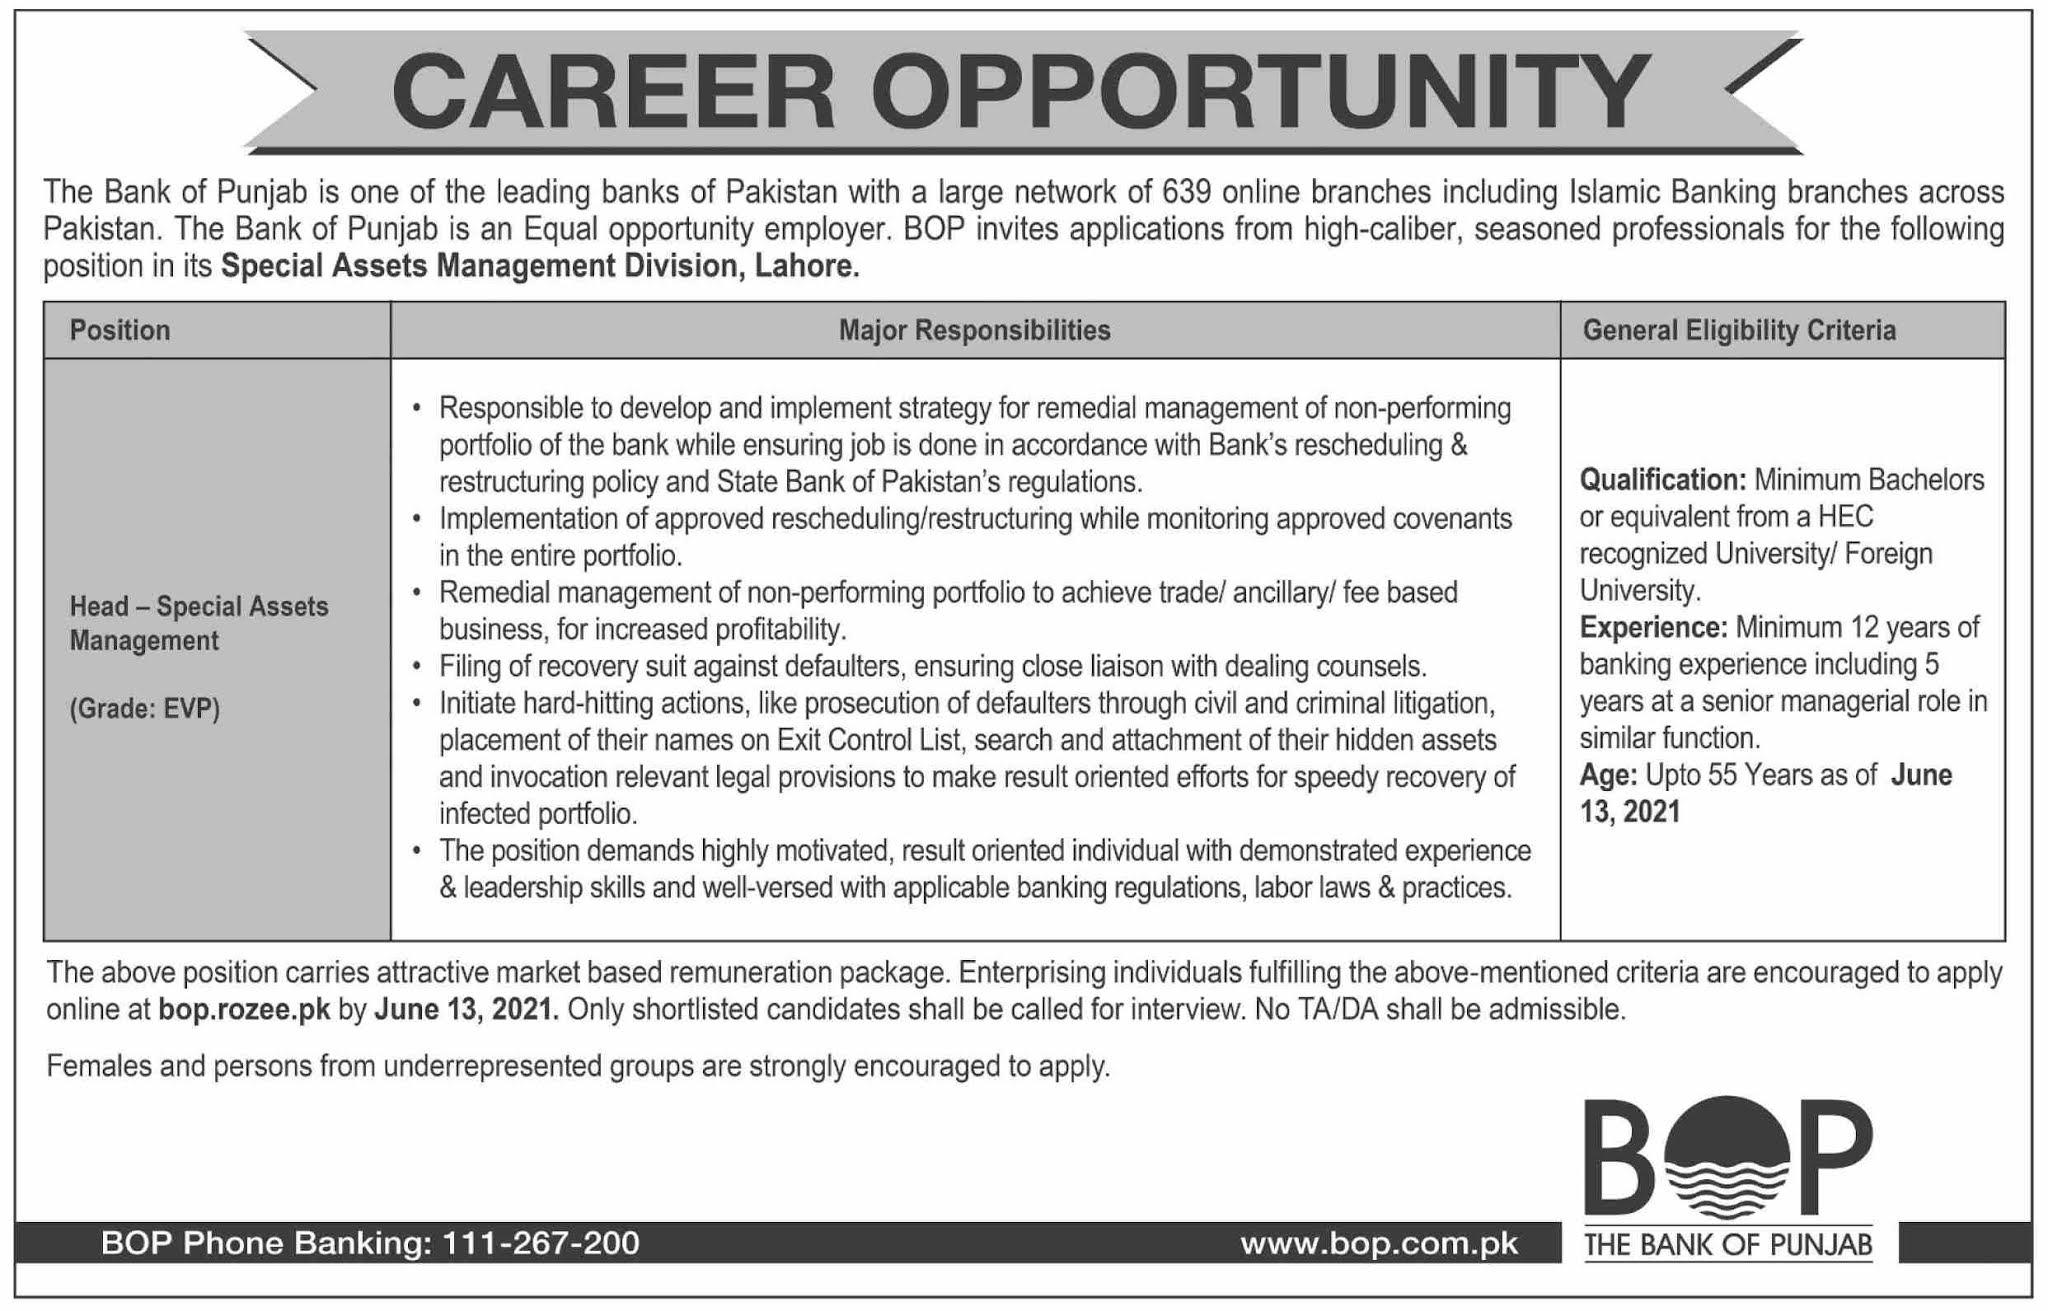 bop.rozee.pk - Bank of Punjab (BOP) Jobs 2021 in Pakistan